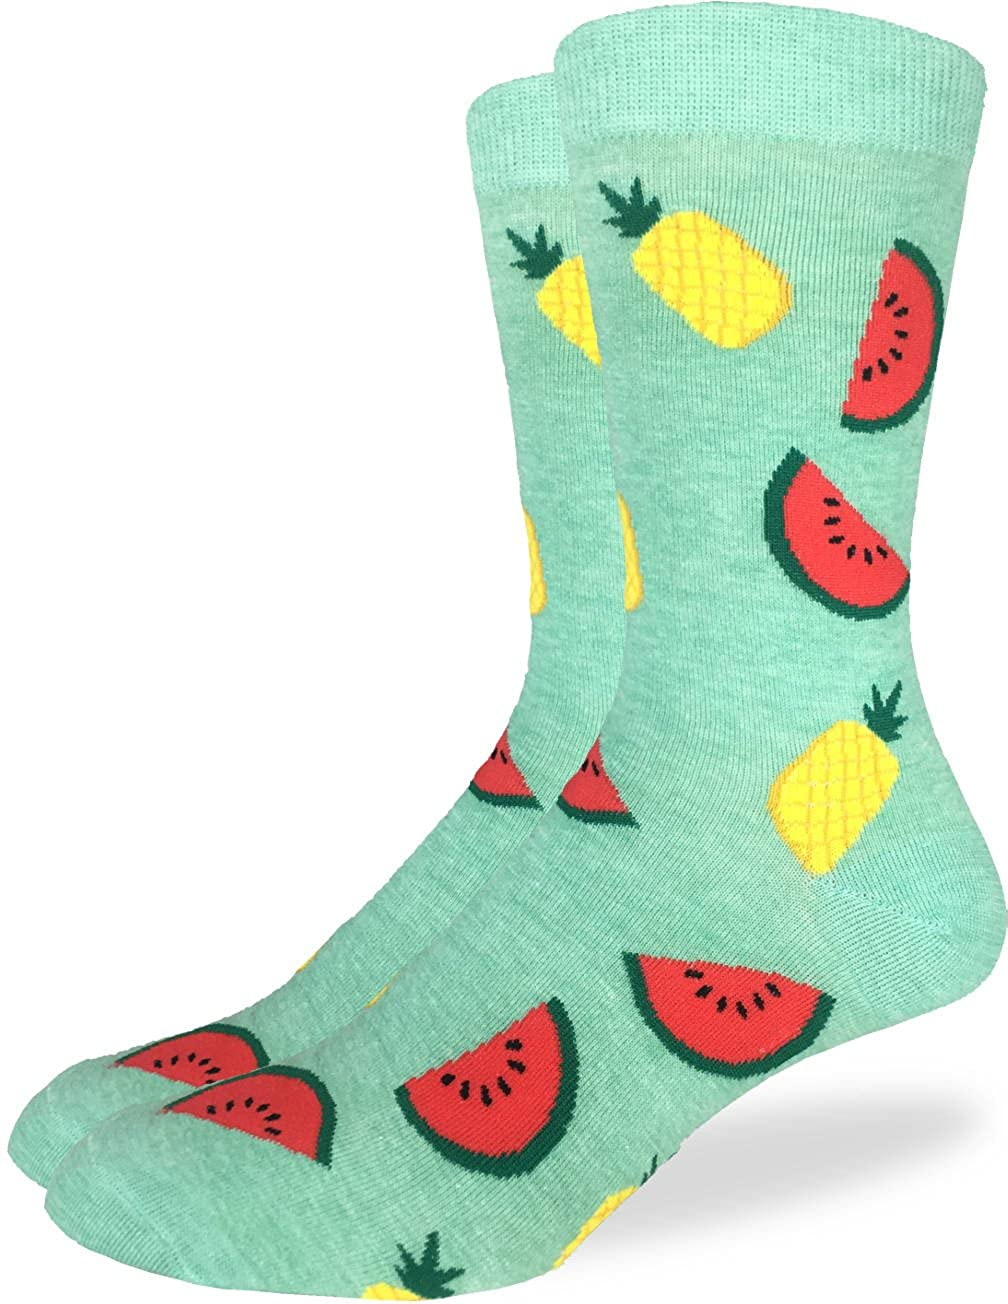 Good Luck Sock Men's Pineapples & Watermelons Crew Socks Green, Shoe size 7-12 1241